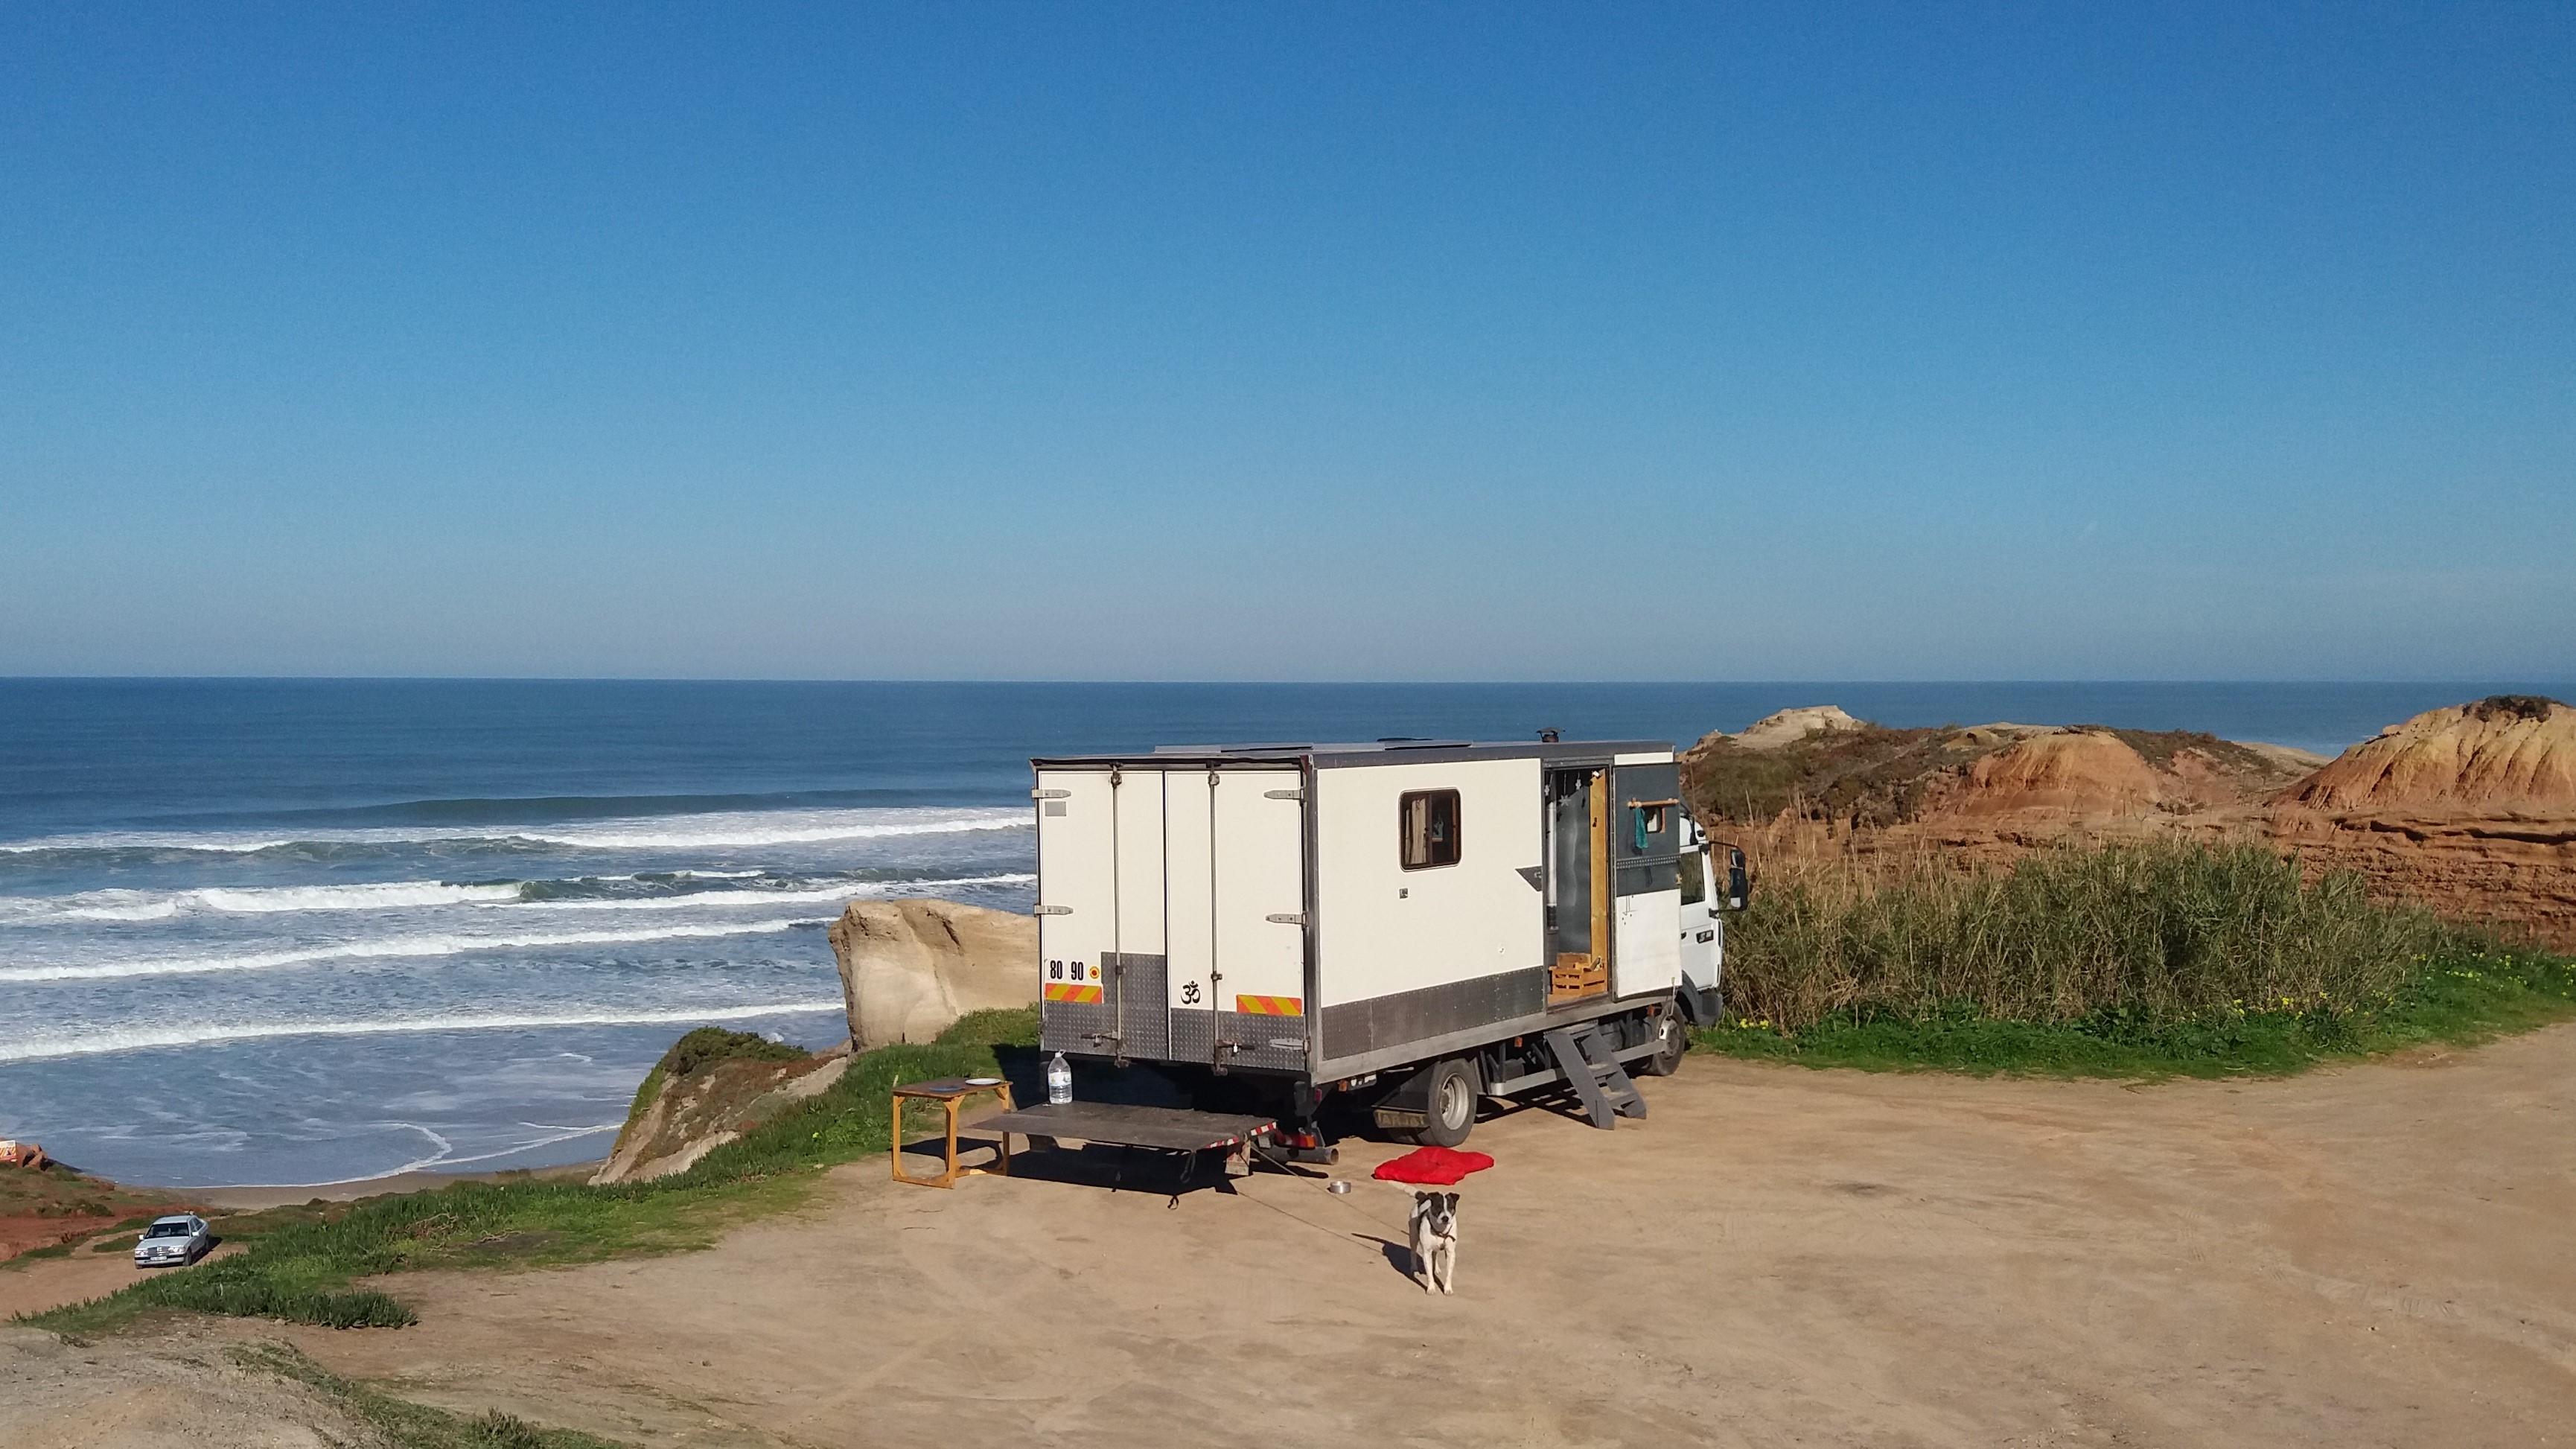 t moignage partir l 39 aventure bord d 39 un camion am nag. Black Bedroom Furniture Sets. Home Design Ideas